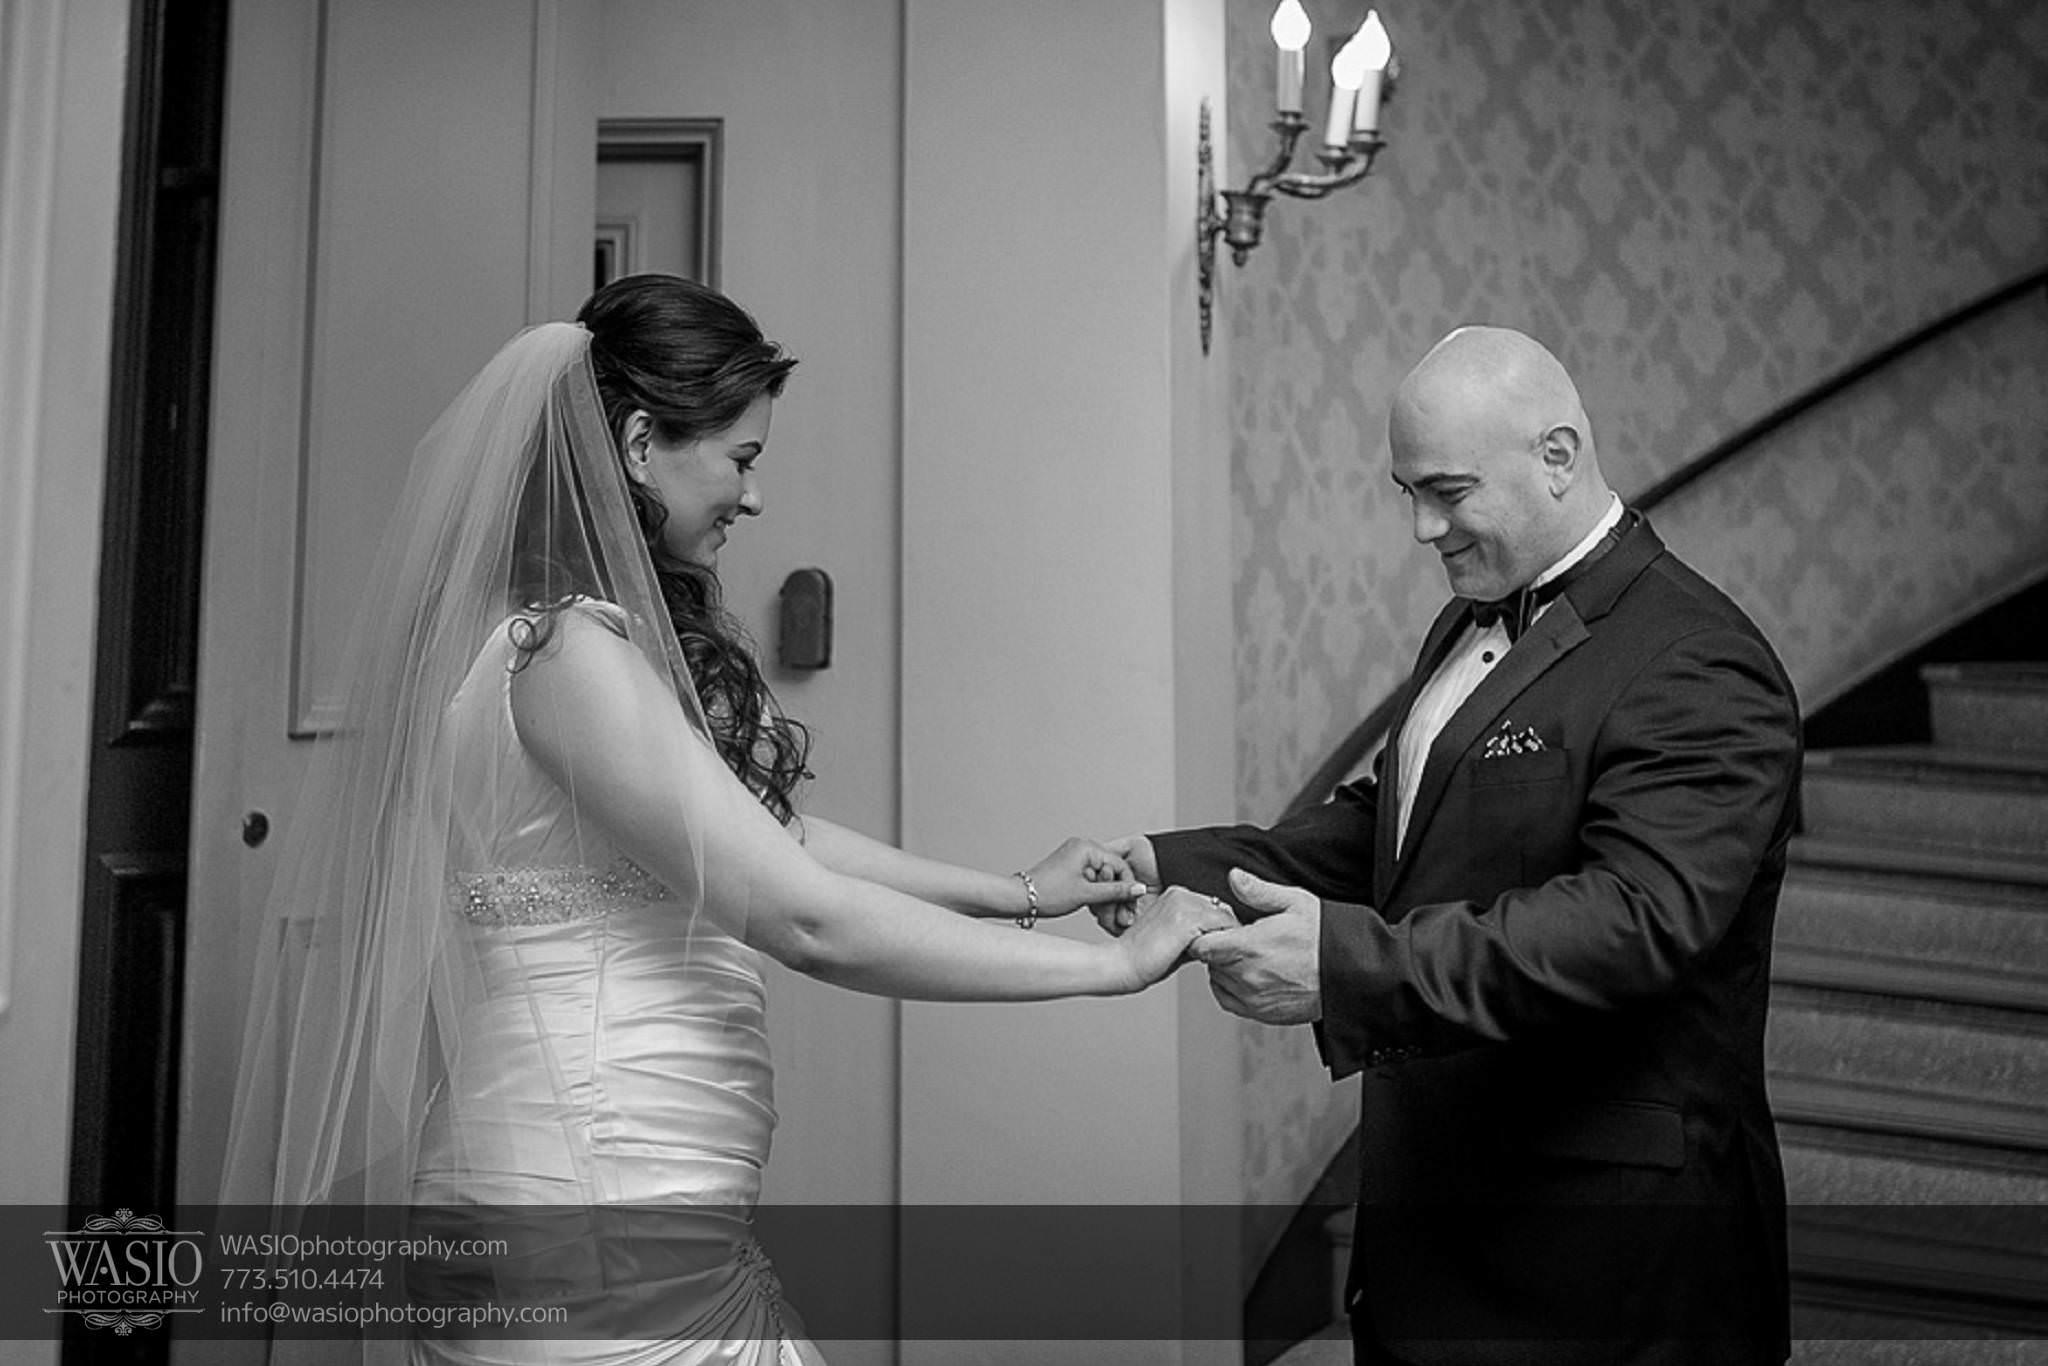 Chicago-wedding-photos-black-white-first-look-romance-052 Chicago Wedding Photos - Svetlana + Yuriy